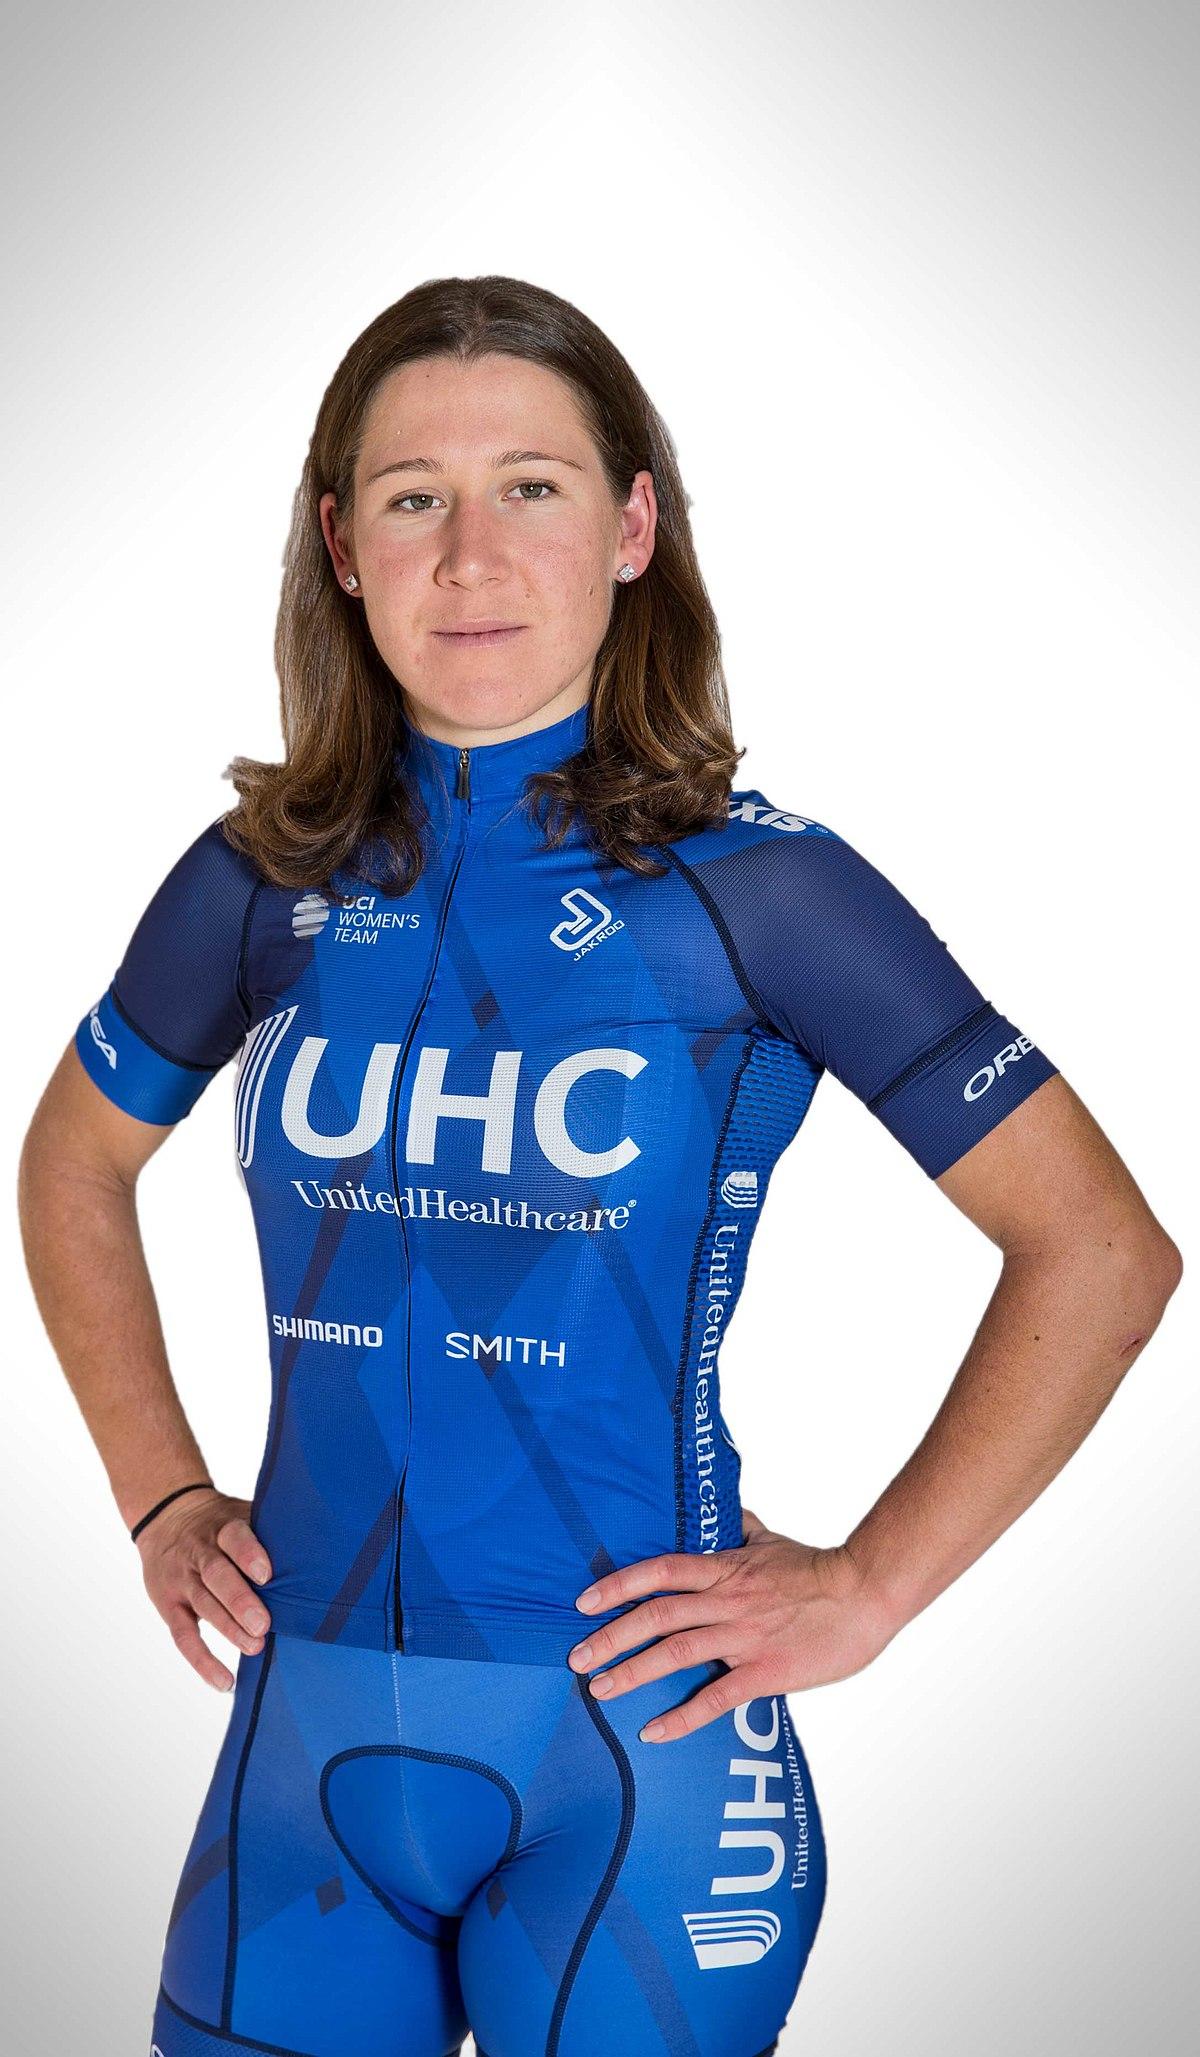 Lauretta Hanson - Wikipedia